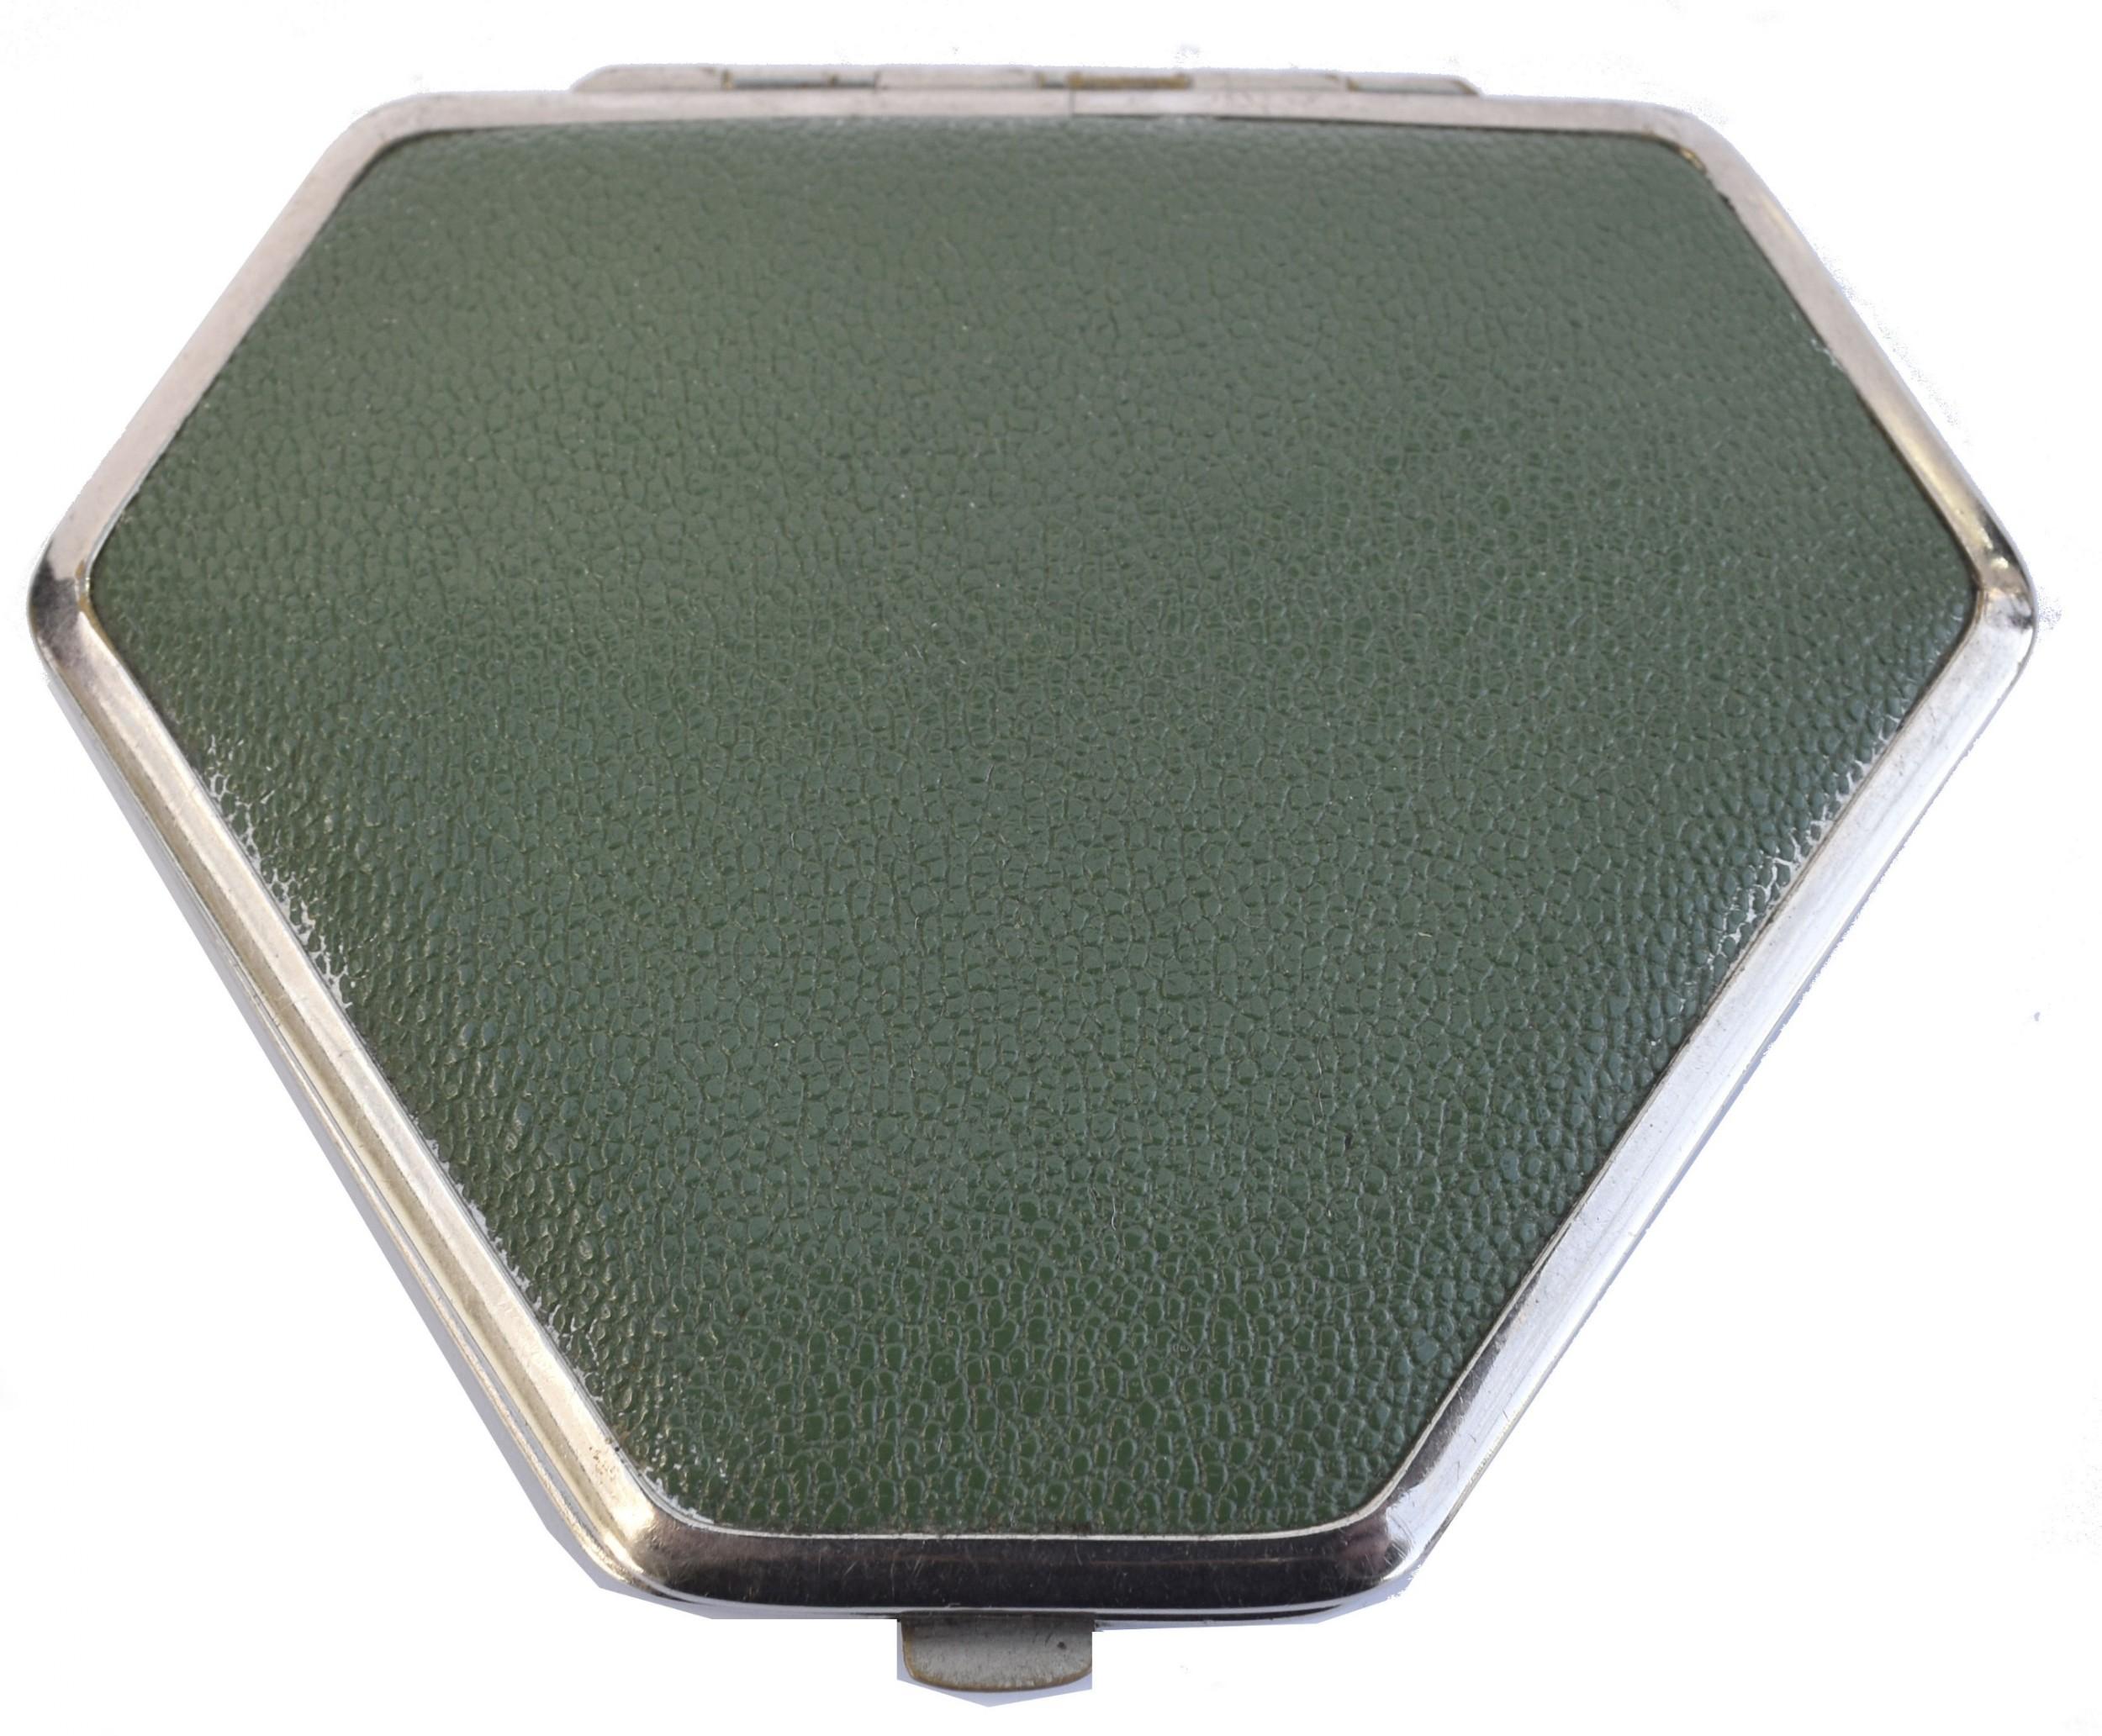 art deco leather chrome powder compact c1930